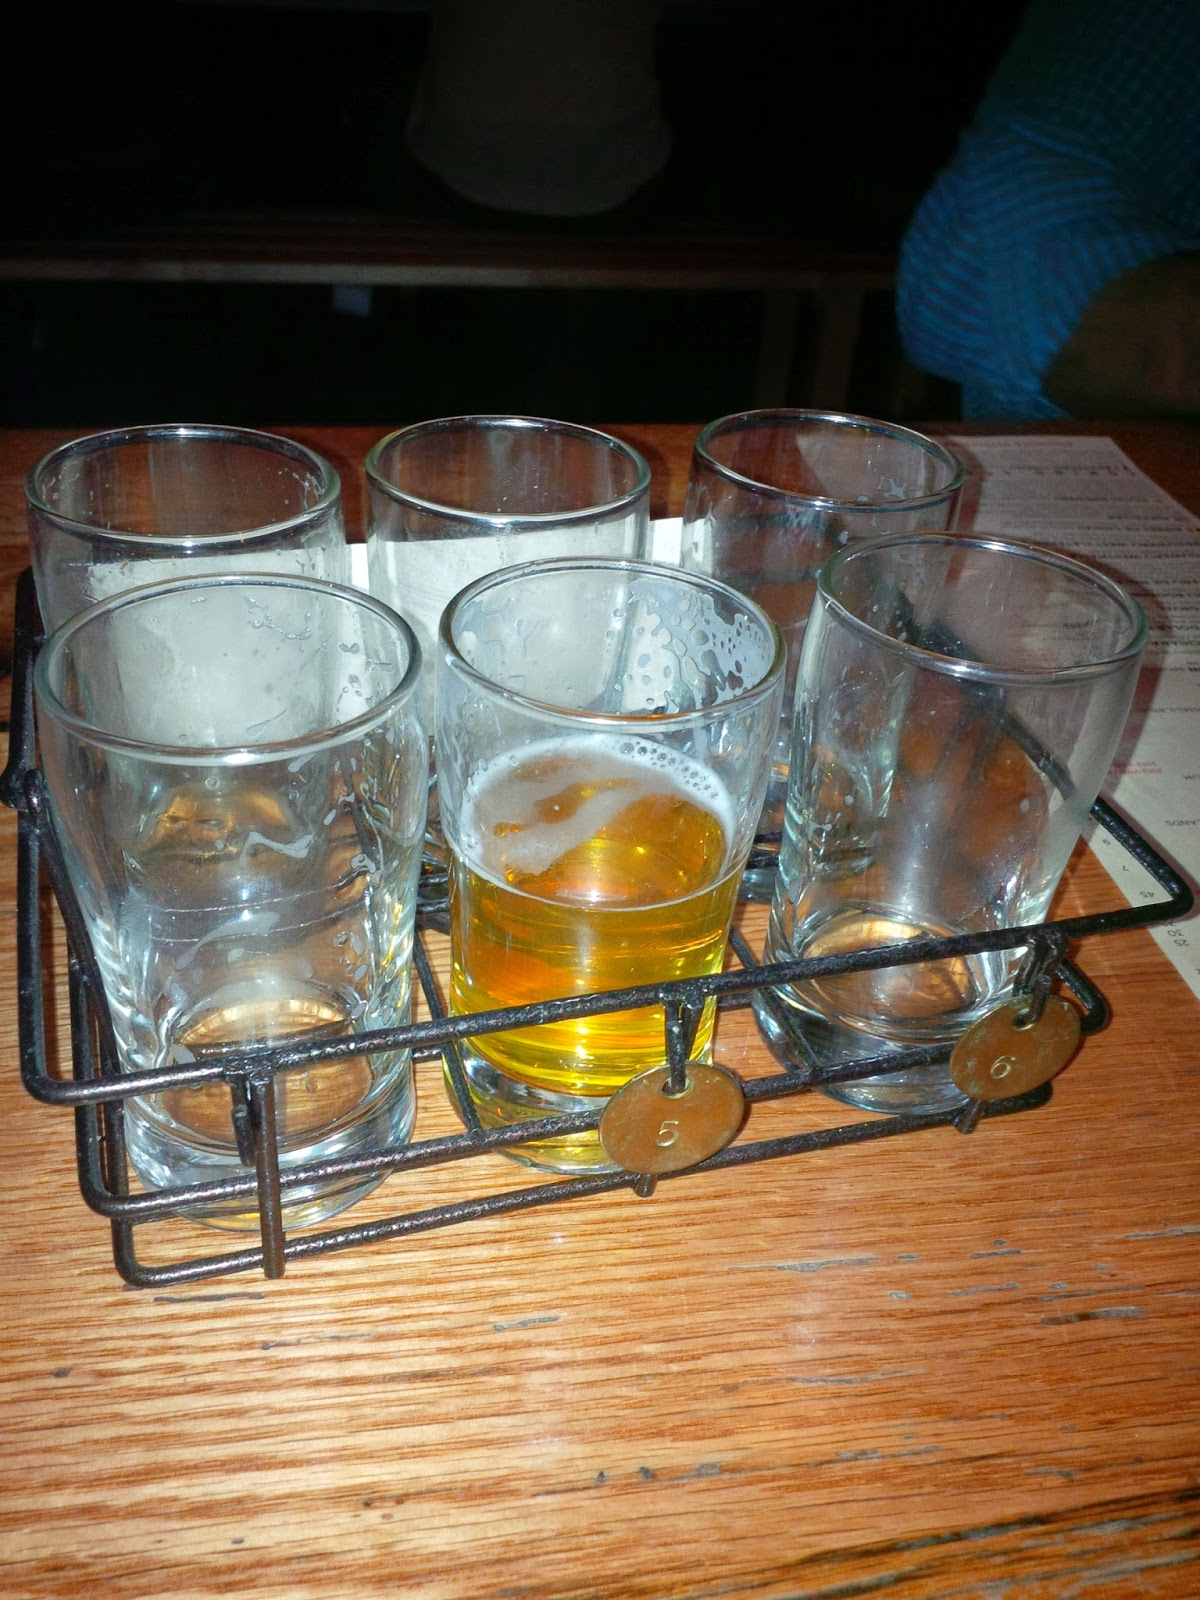 Wurst beer